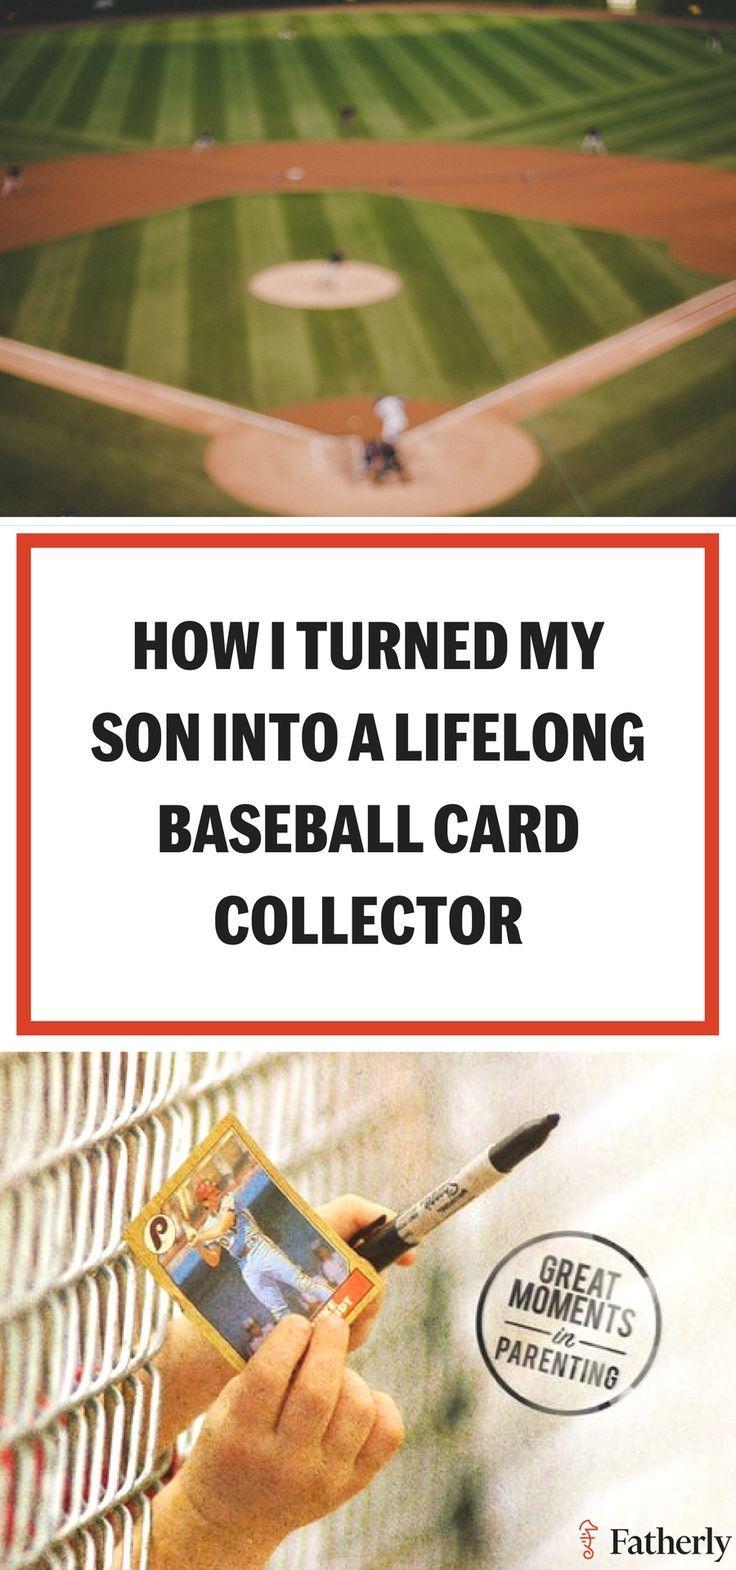 How I Turned My Son Into A Lifelong Baseball Card Collector